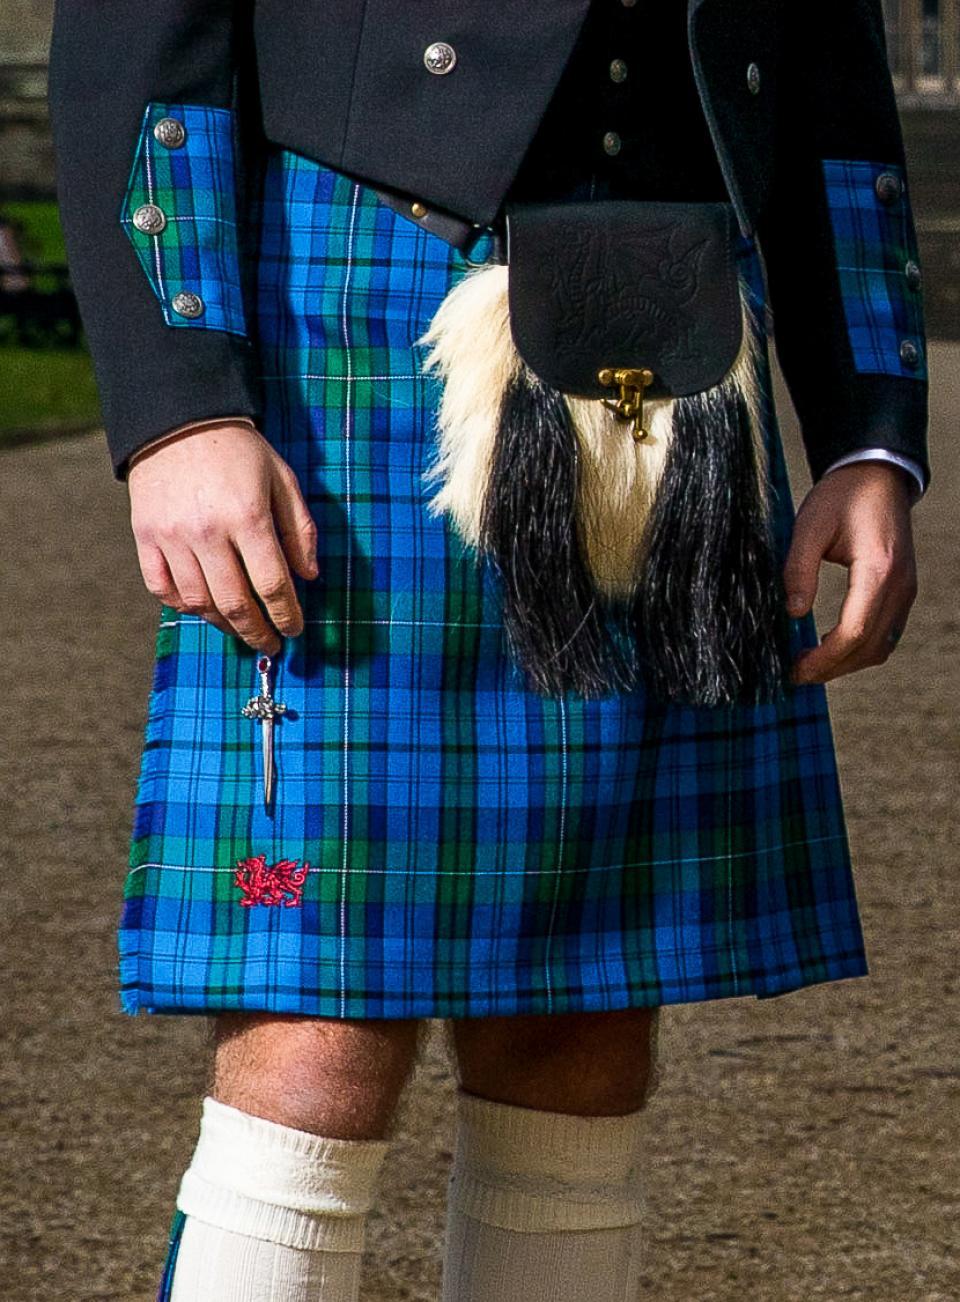 Scottish 8 Yard TARTAN KILT Matching Kilt Sporran Available in 40 Clan Tartan